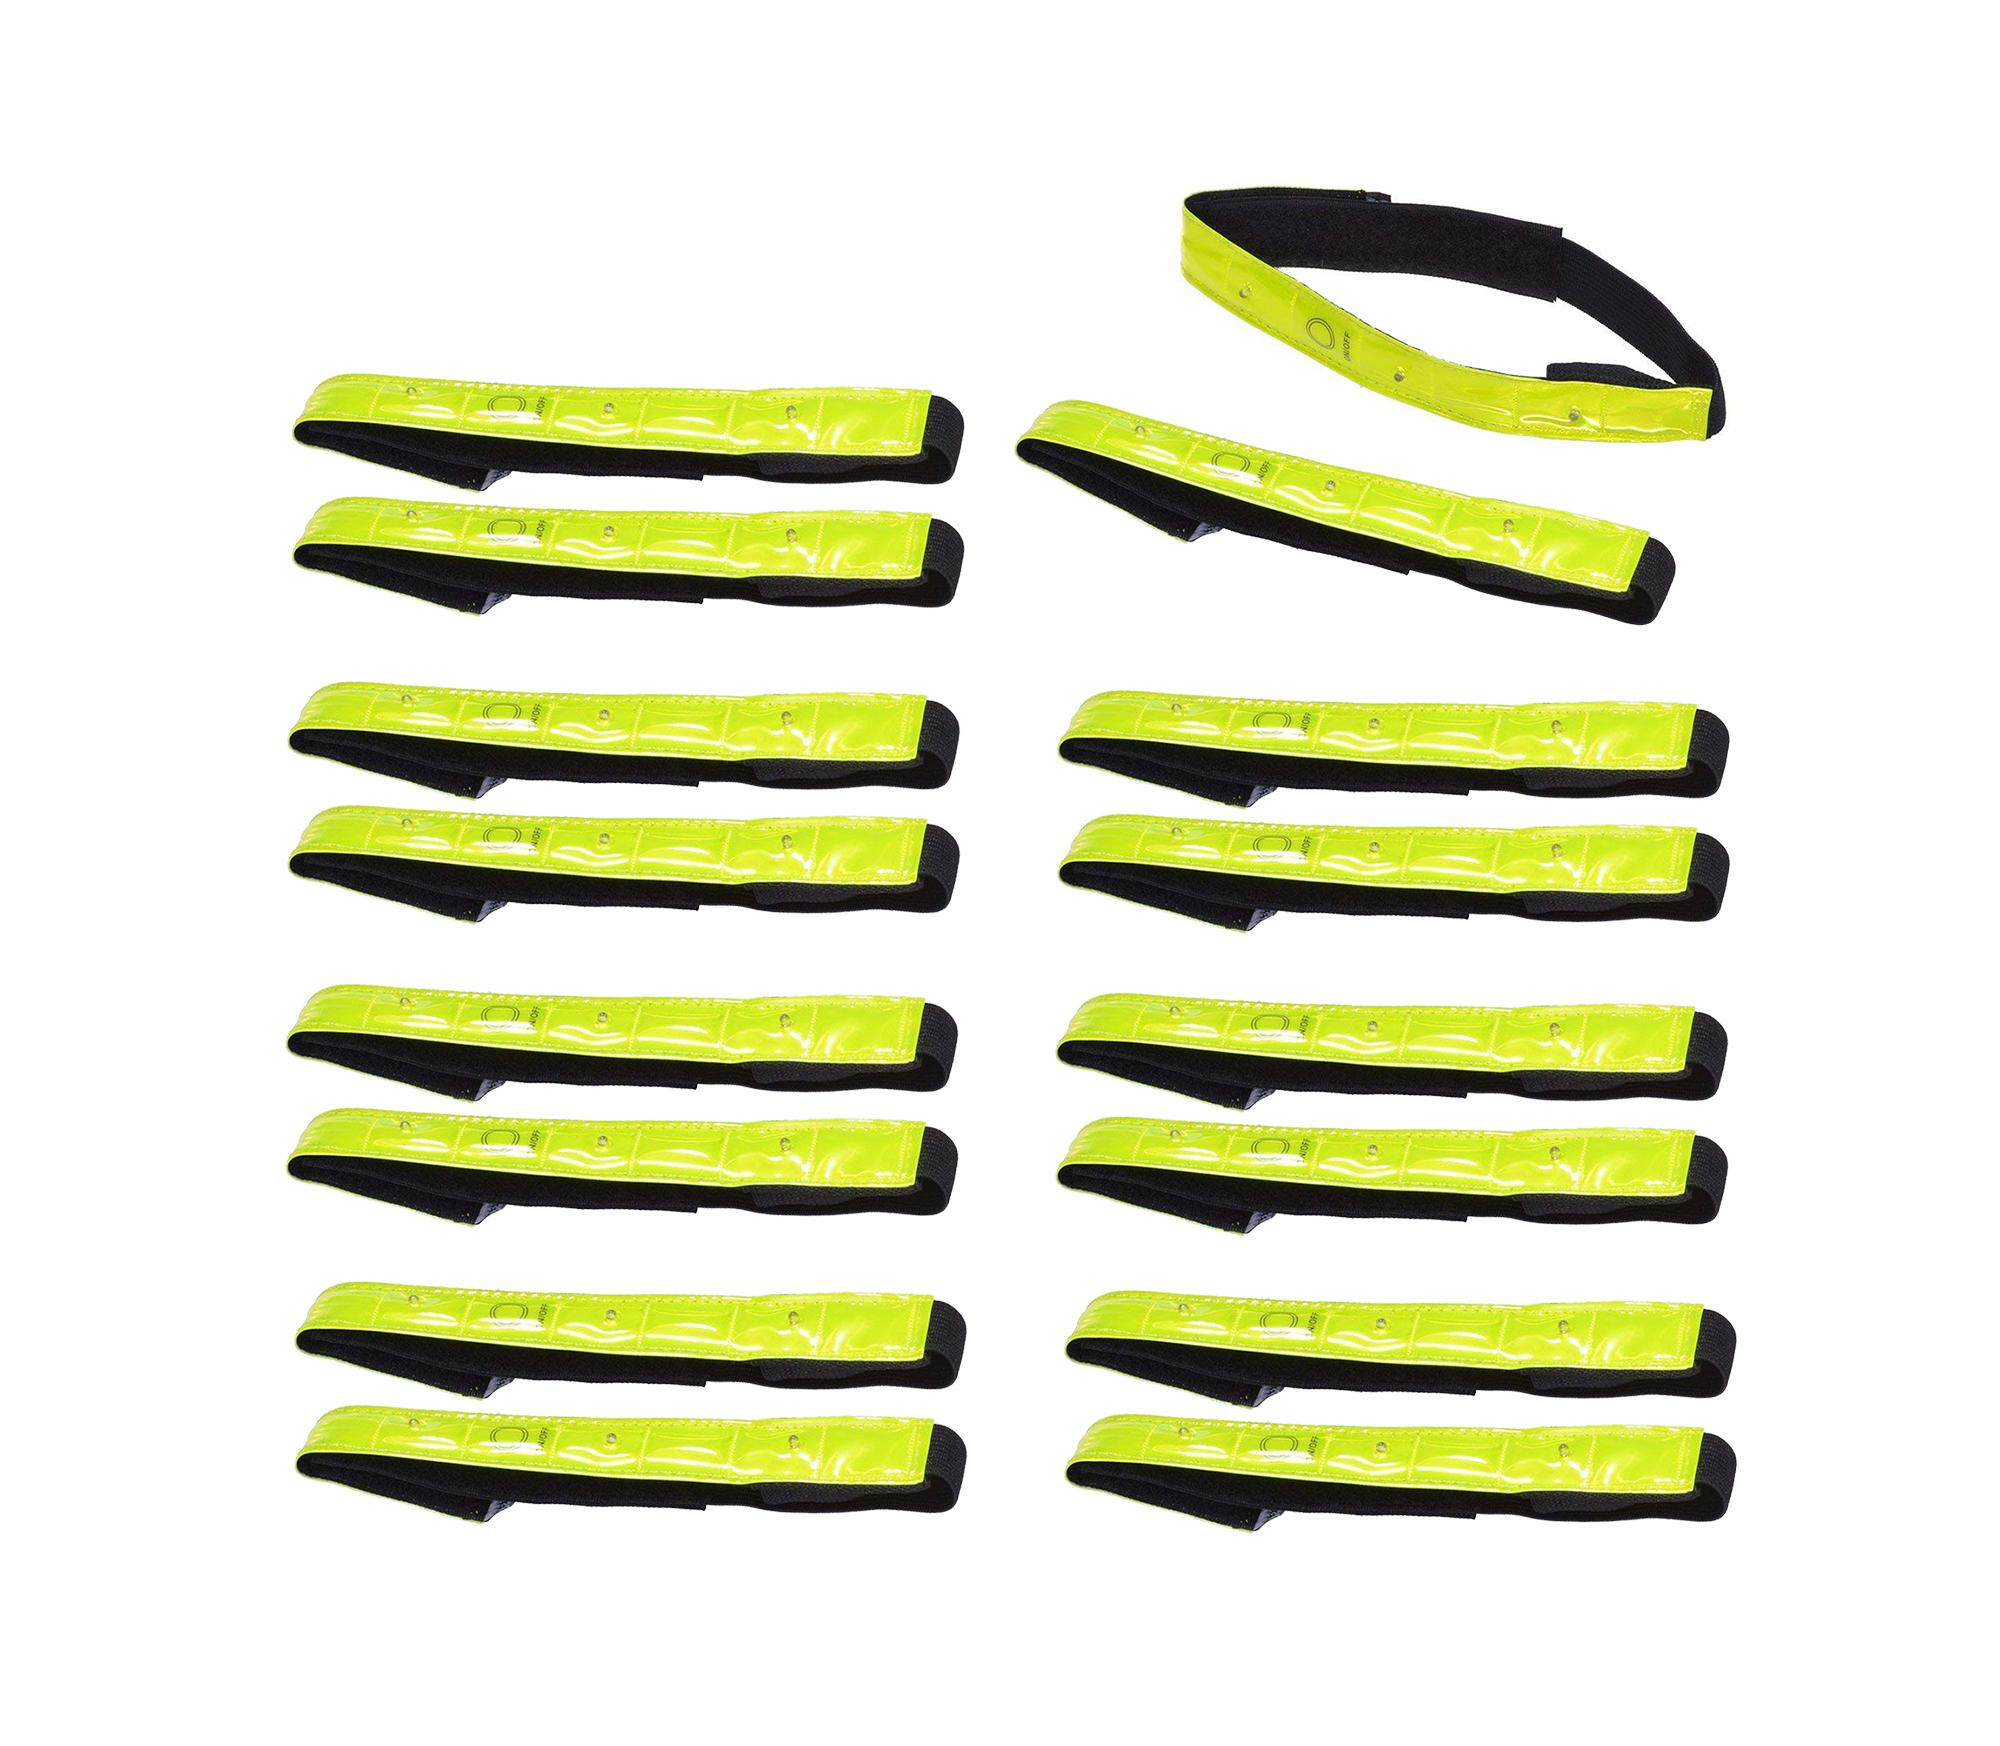 8x Sicherheits Reflektorbänder Reflektorband LED Fahrrad Sicherheits Armreflekt